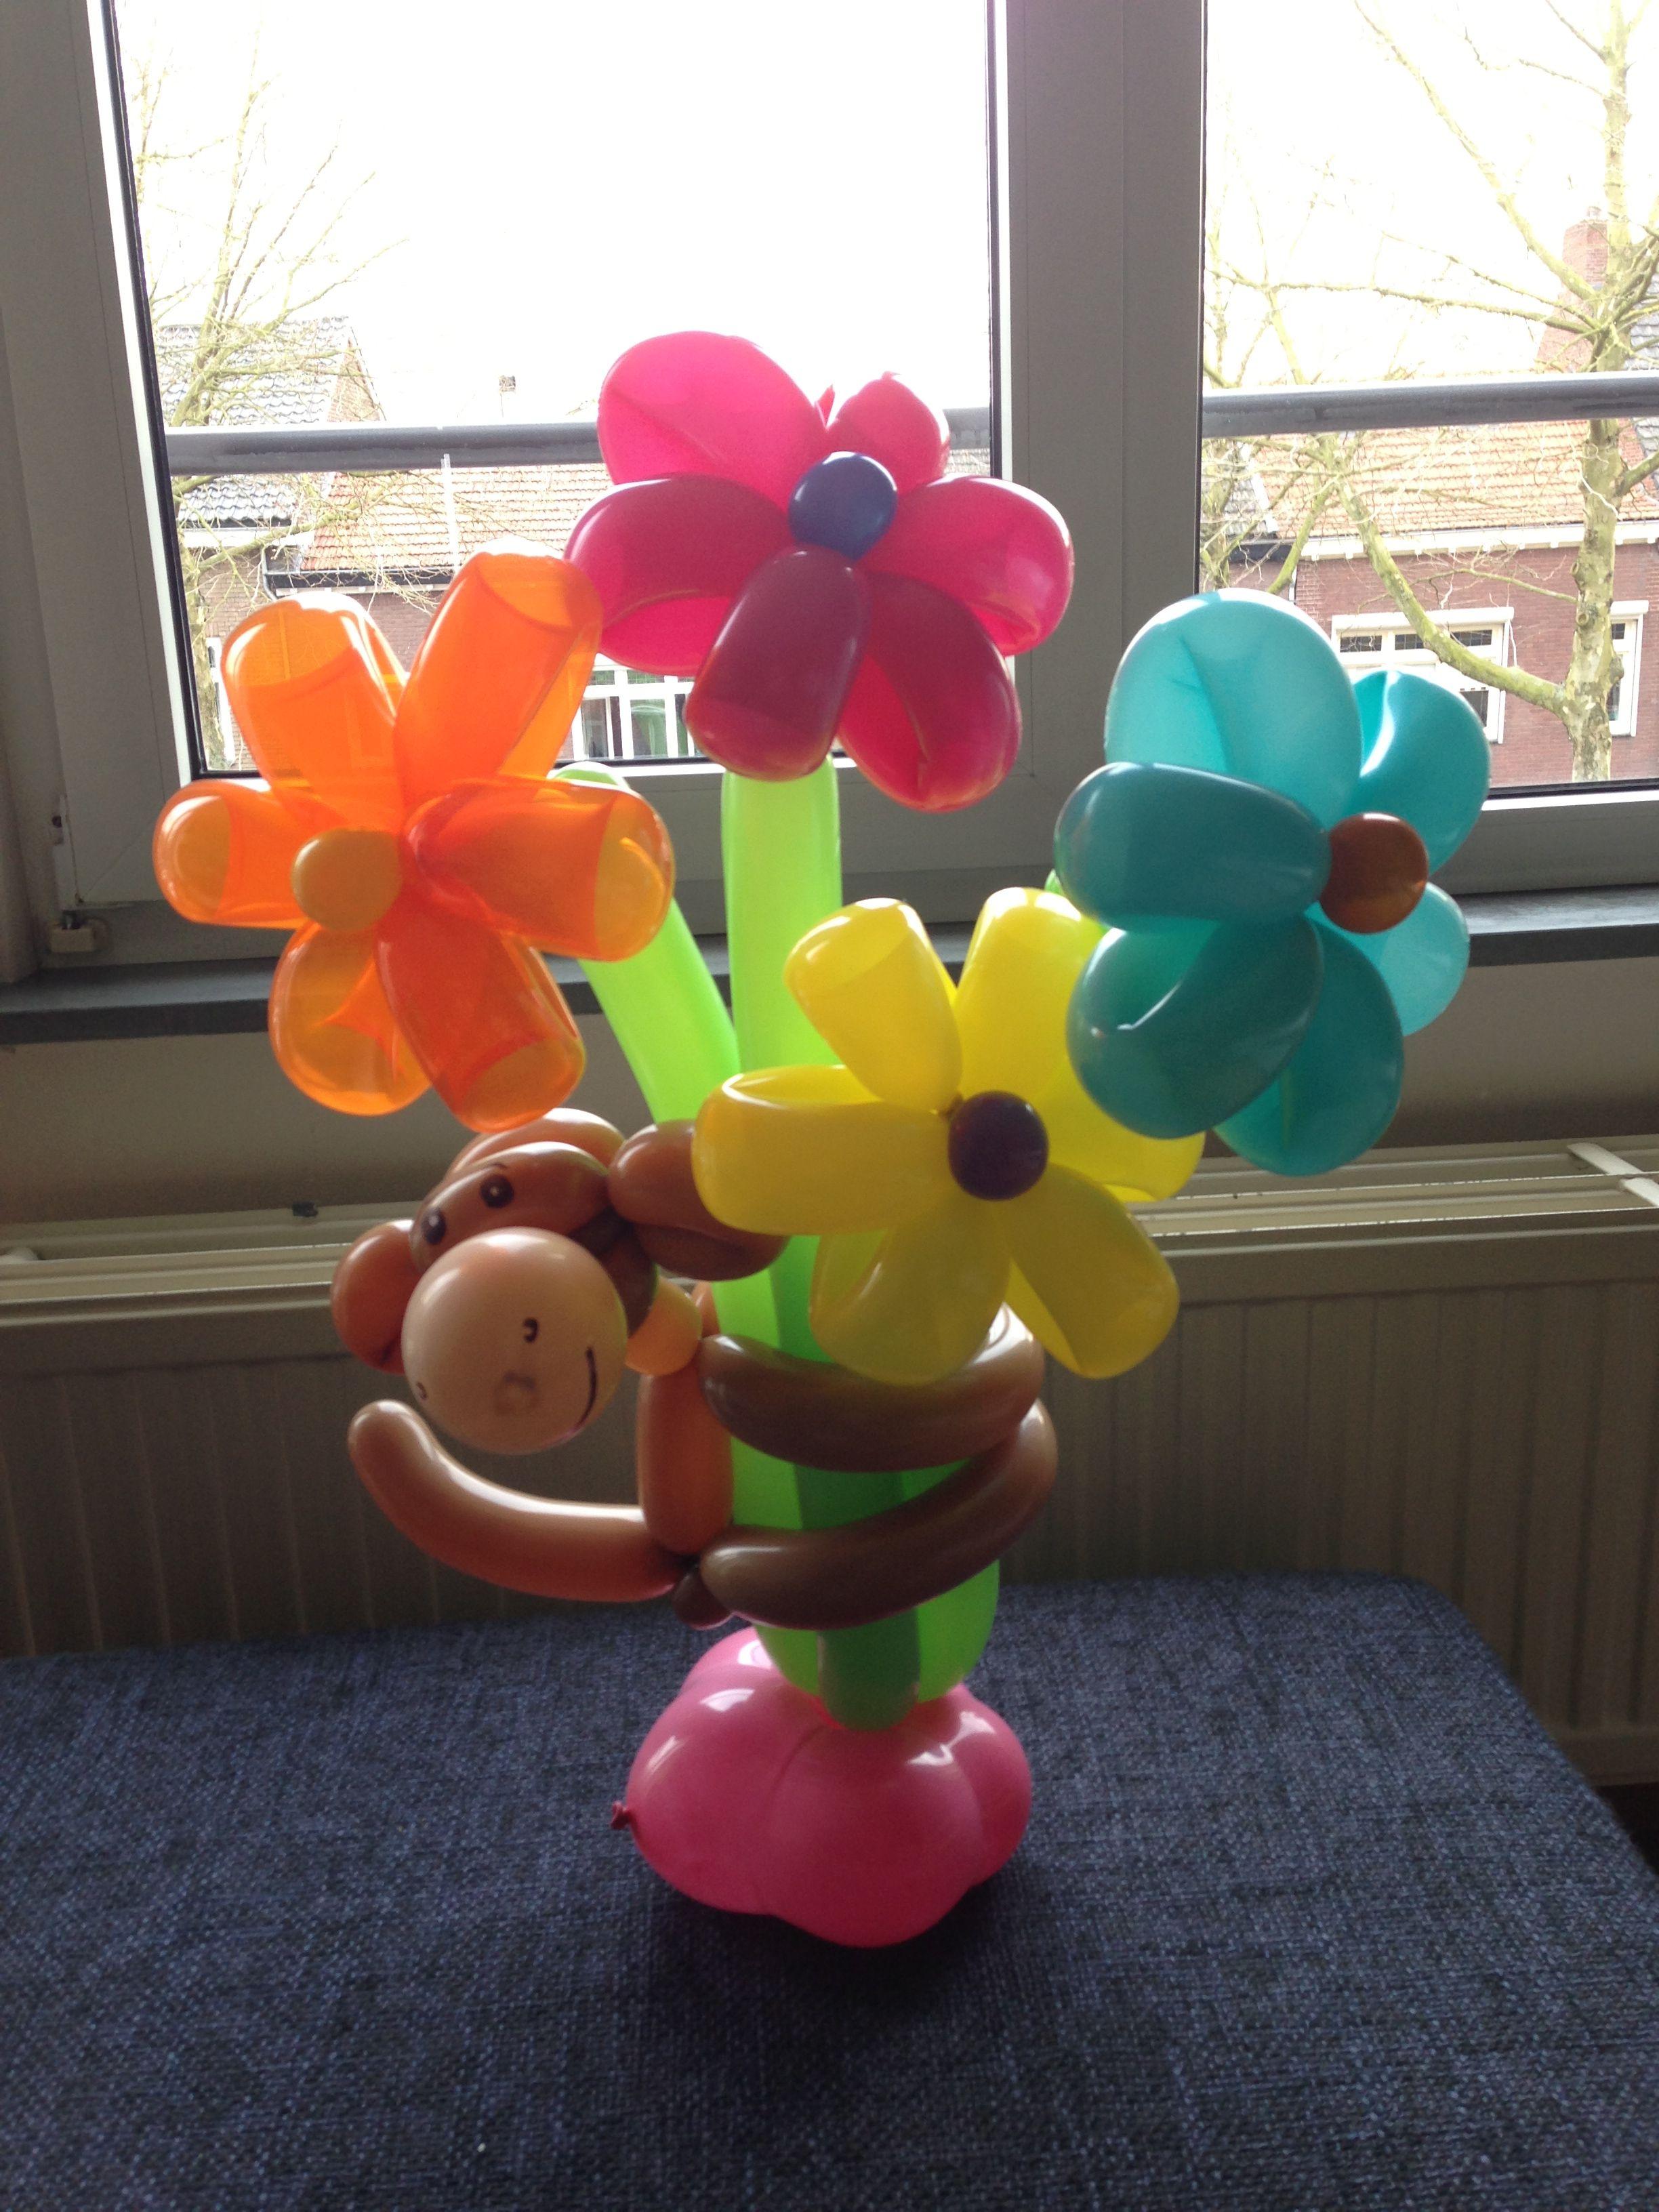 Met Aapje Balloon Flower Bouquet With Monkey Made By Clown Tallie